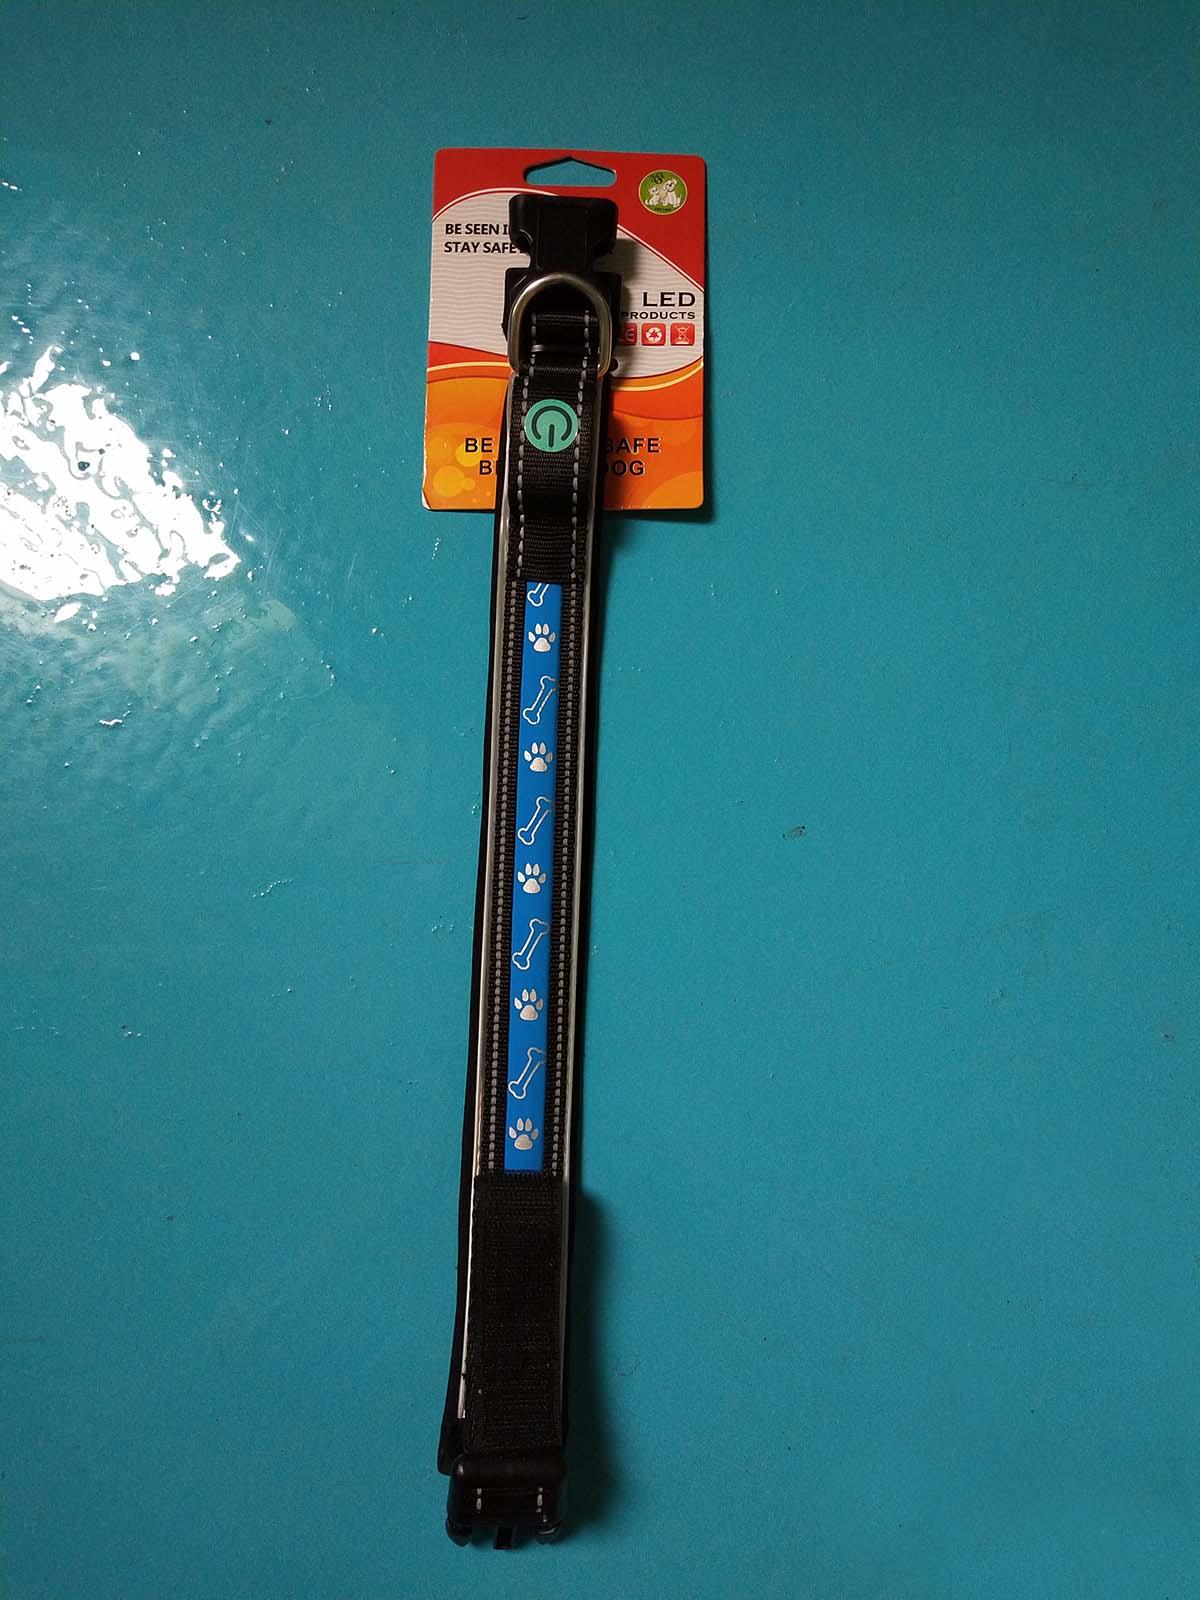 AIDI-Dog Collar Lights Waterproof Manufacture | Aidi-c1 Led Dog Collar-6